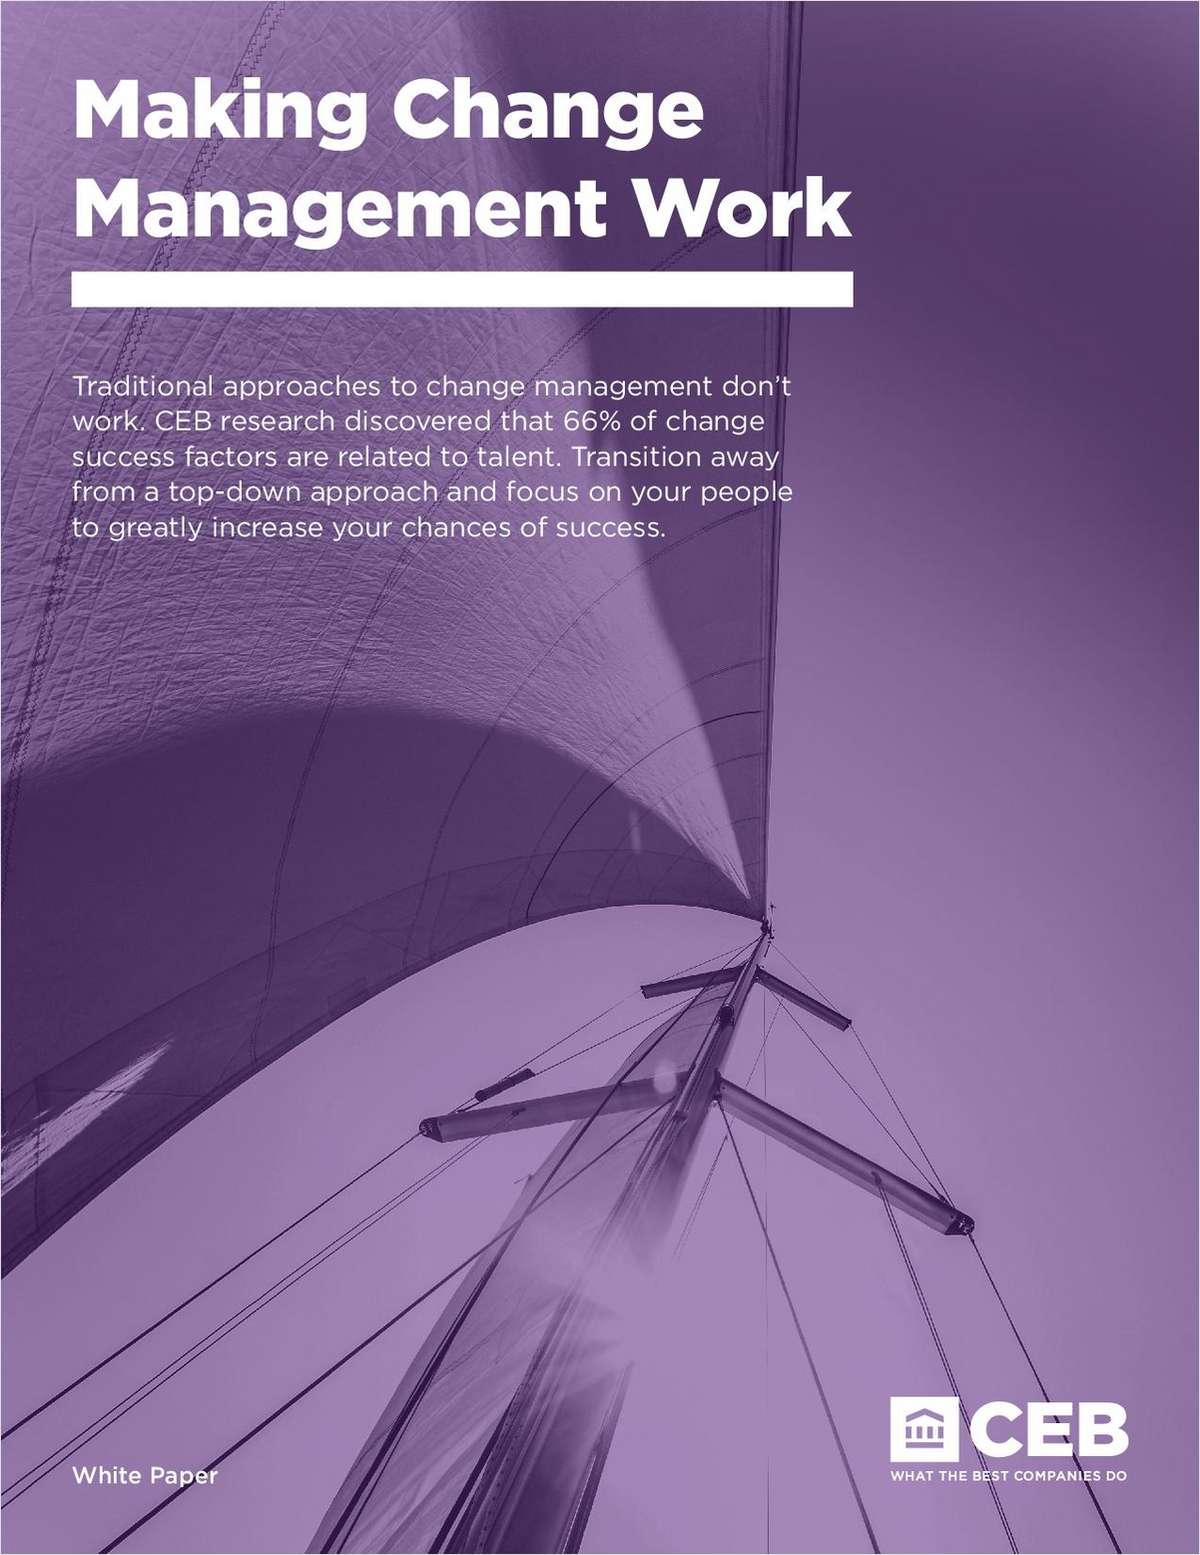 Making Change Management Work